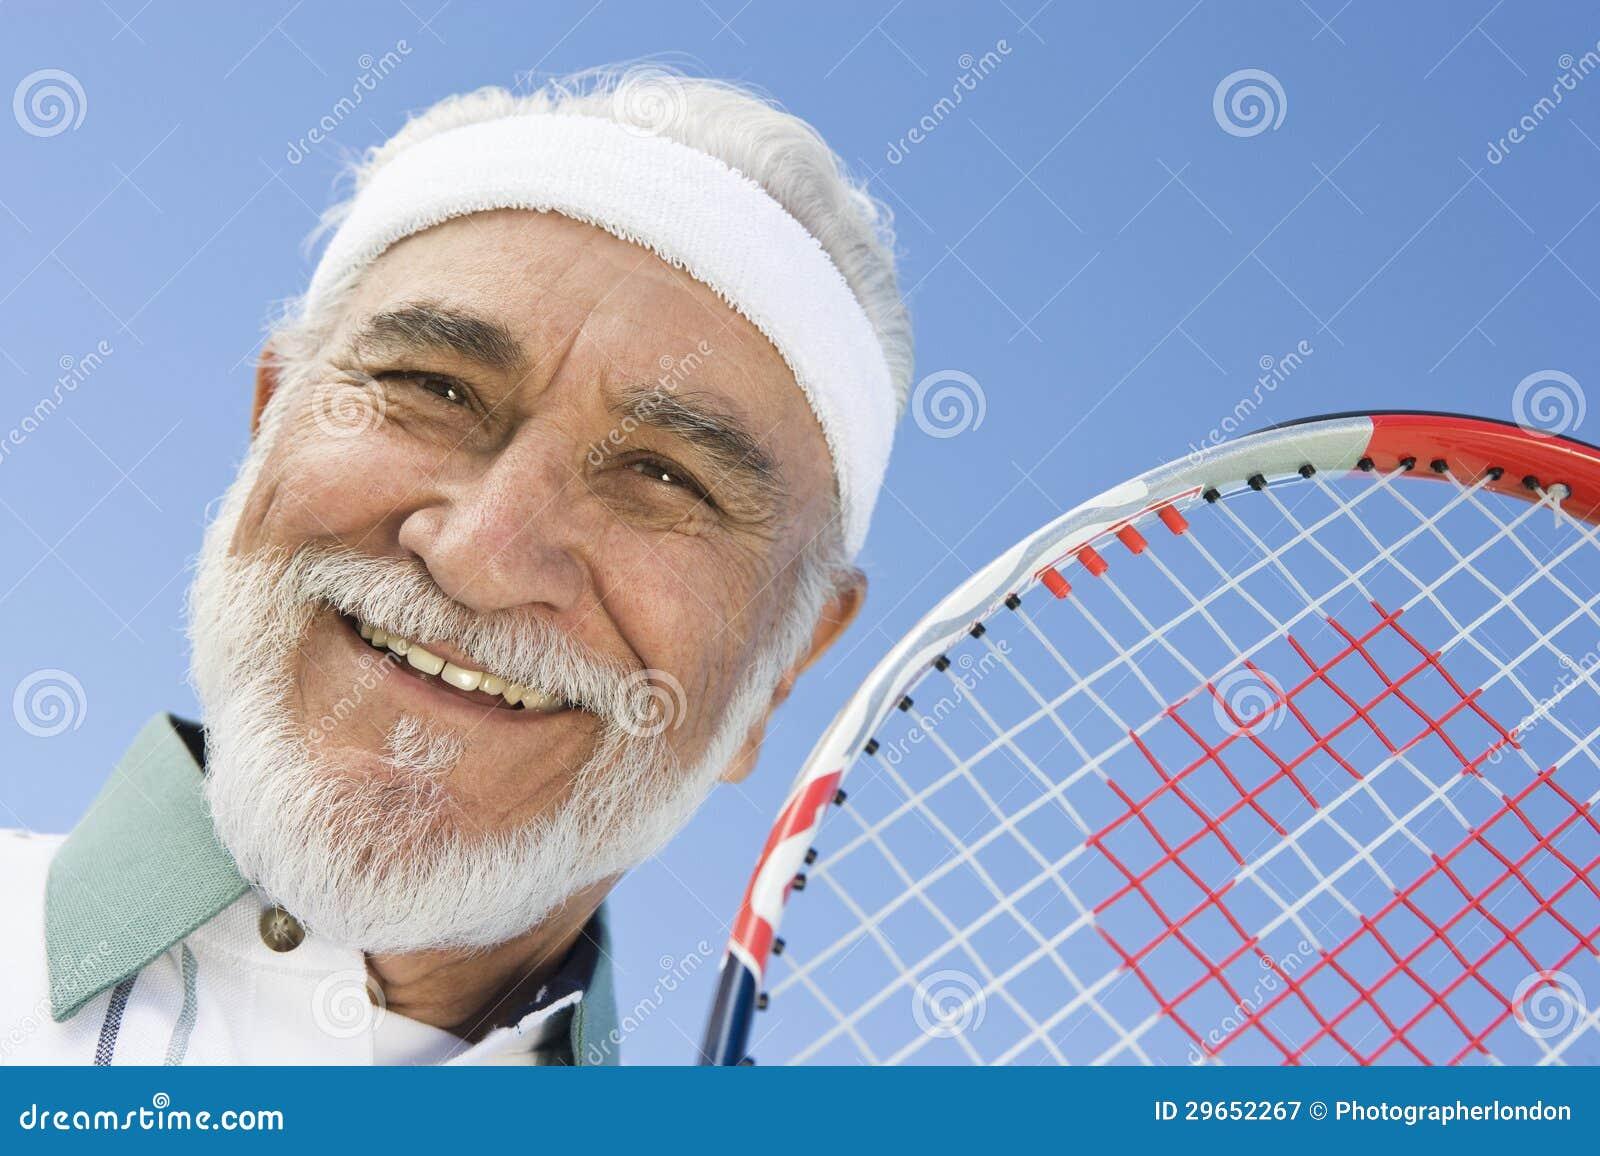 Hispanic Senior Tennis Player Stock Image Cartoondealer